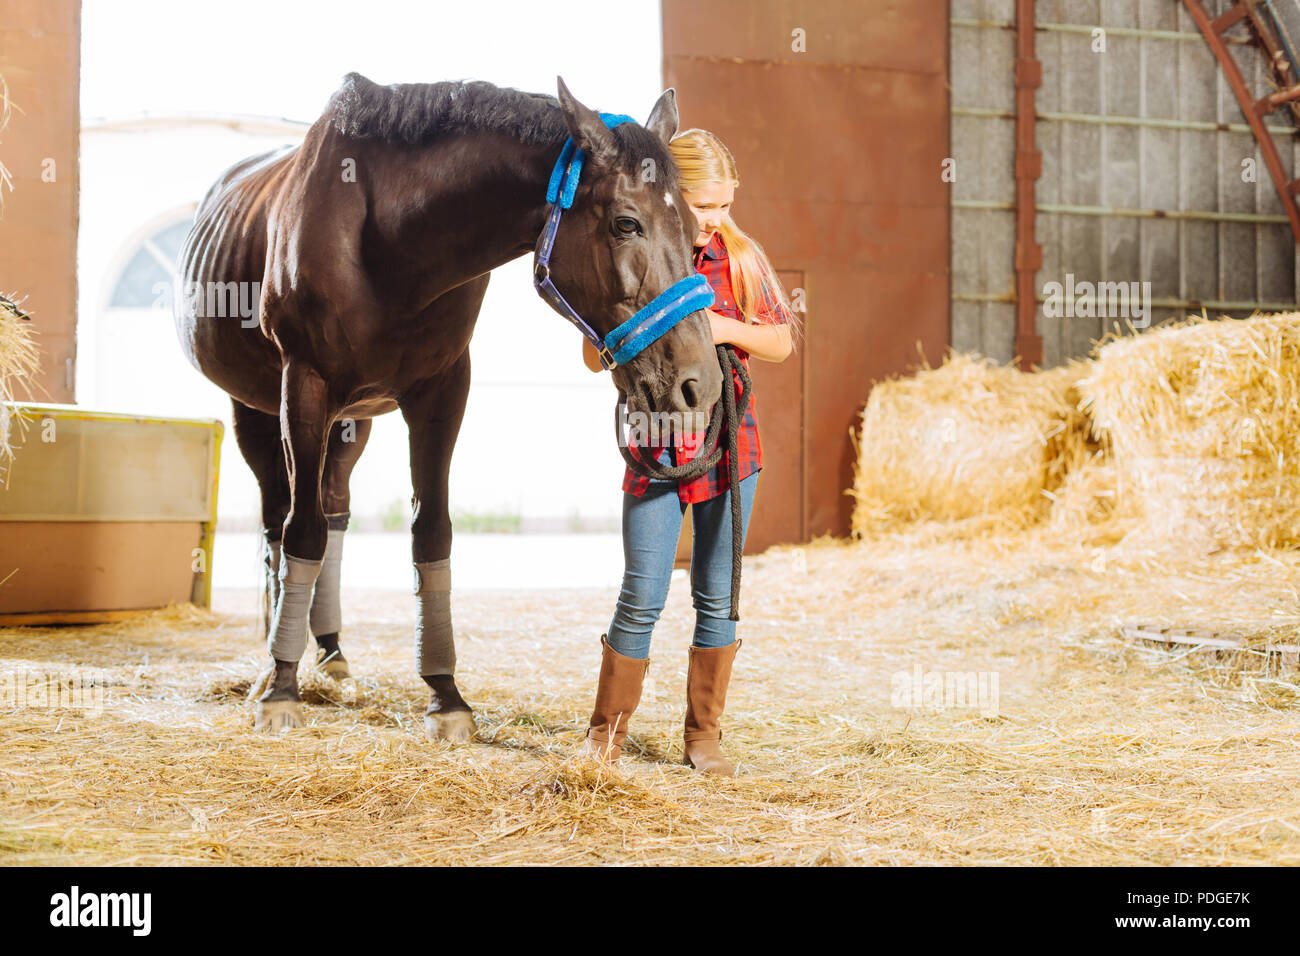 Blonde-haired schoolgirl leaning on beautiful dark horse - Stock Image